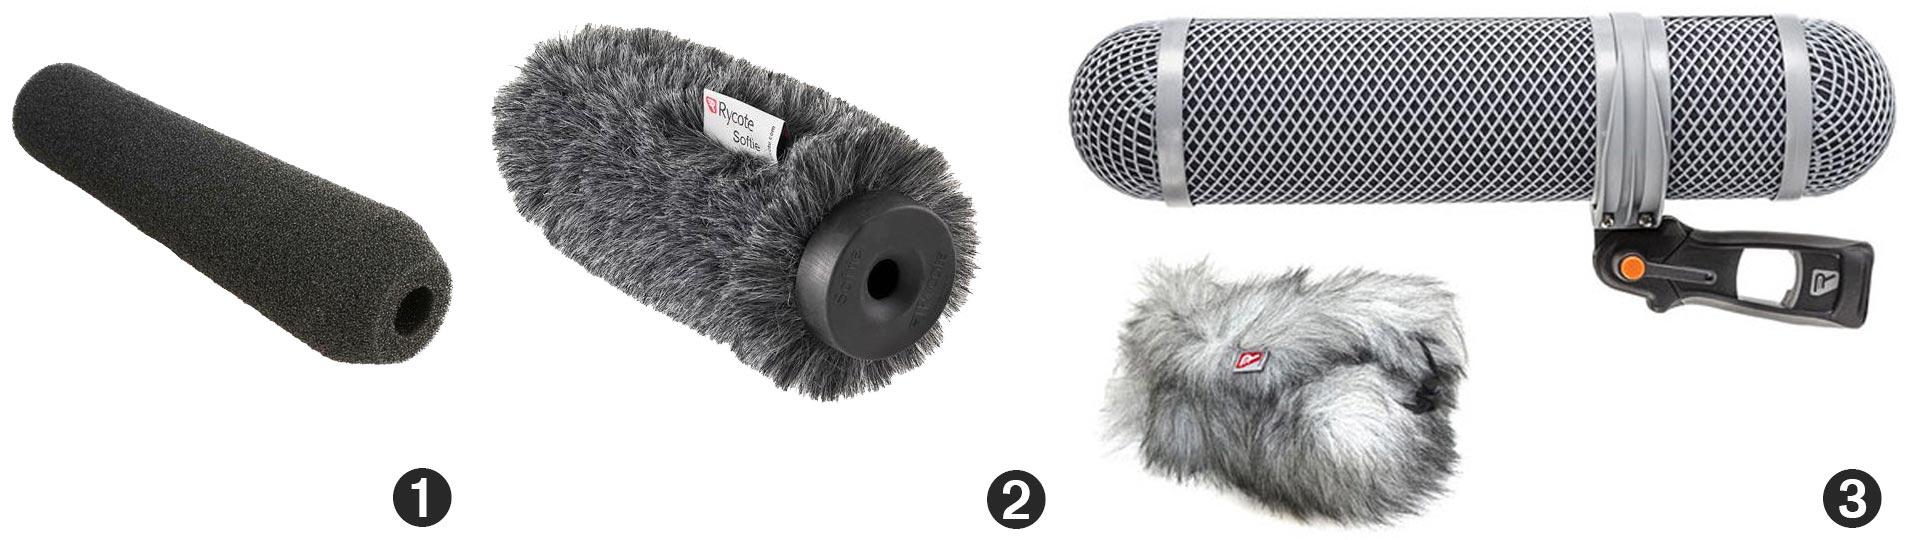 1. Foam Windshield (image); 2. Rycote Softie (image); Rycote Modular Windshield (image)